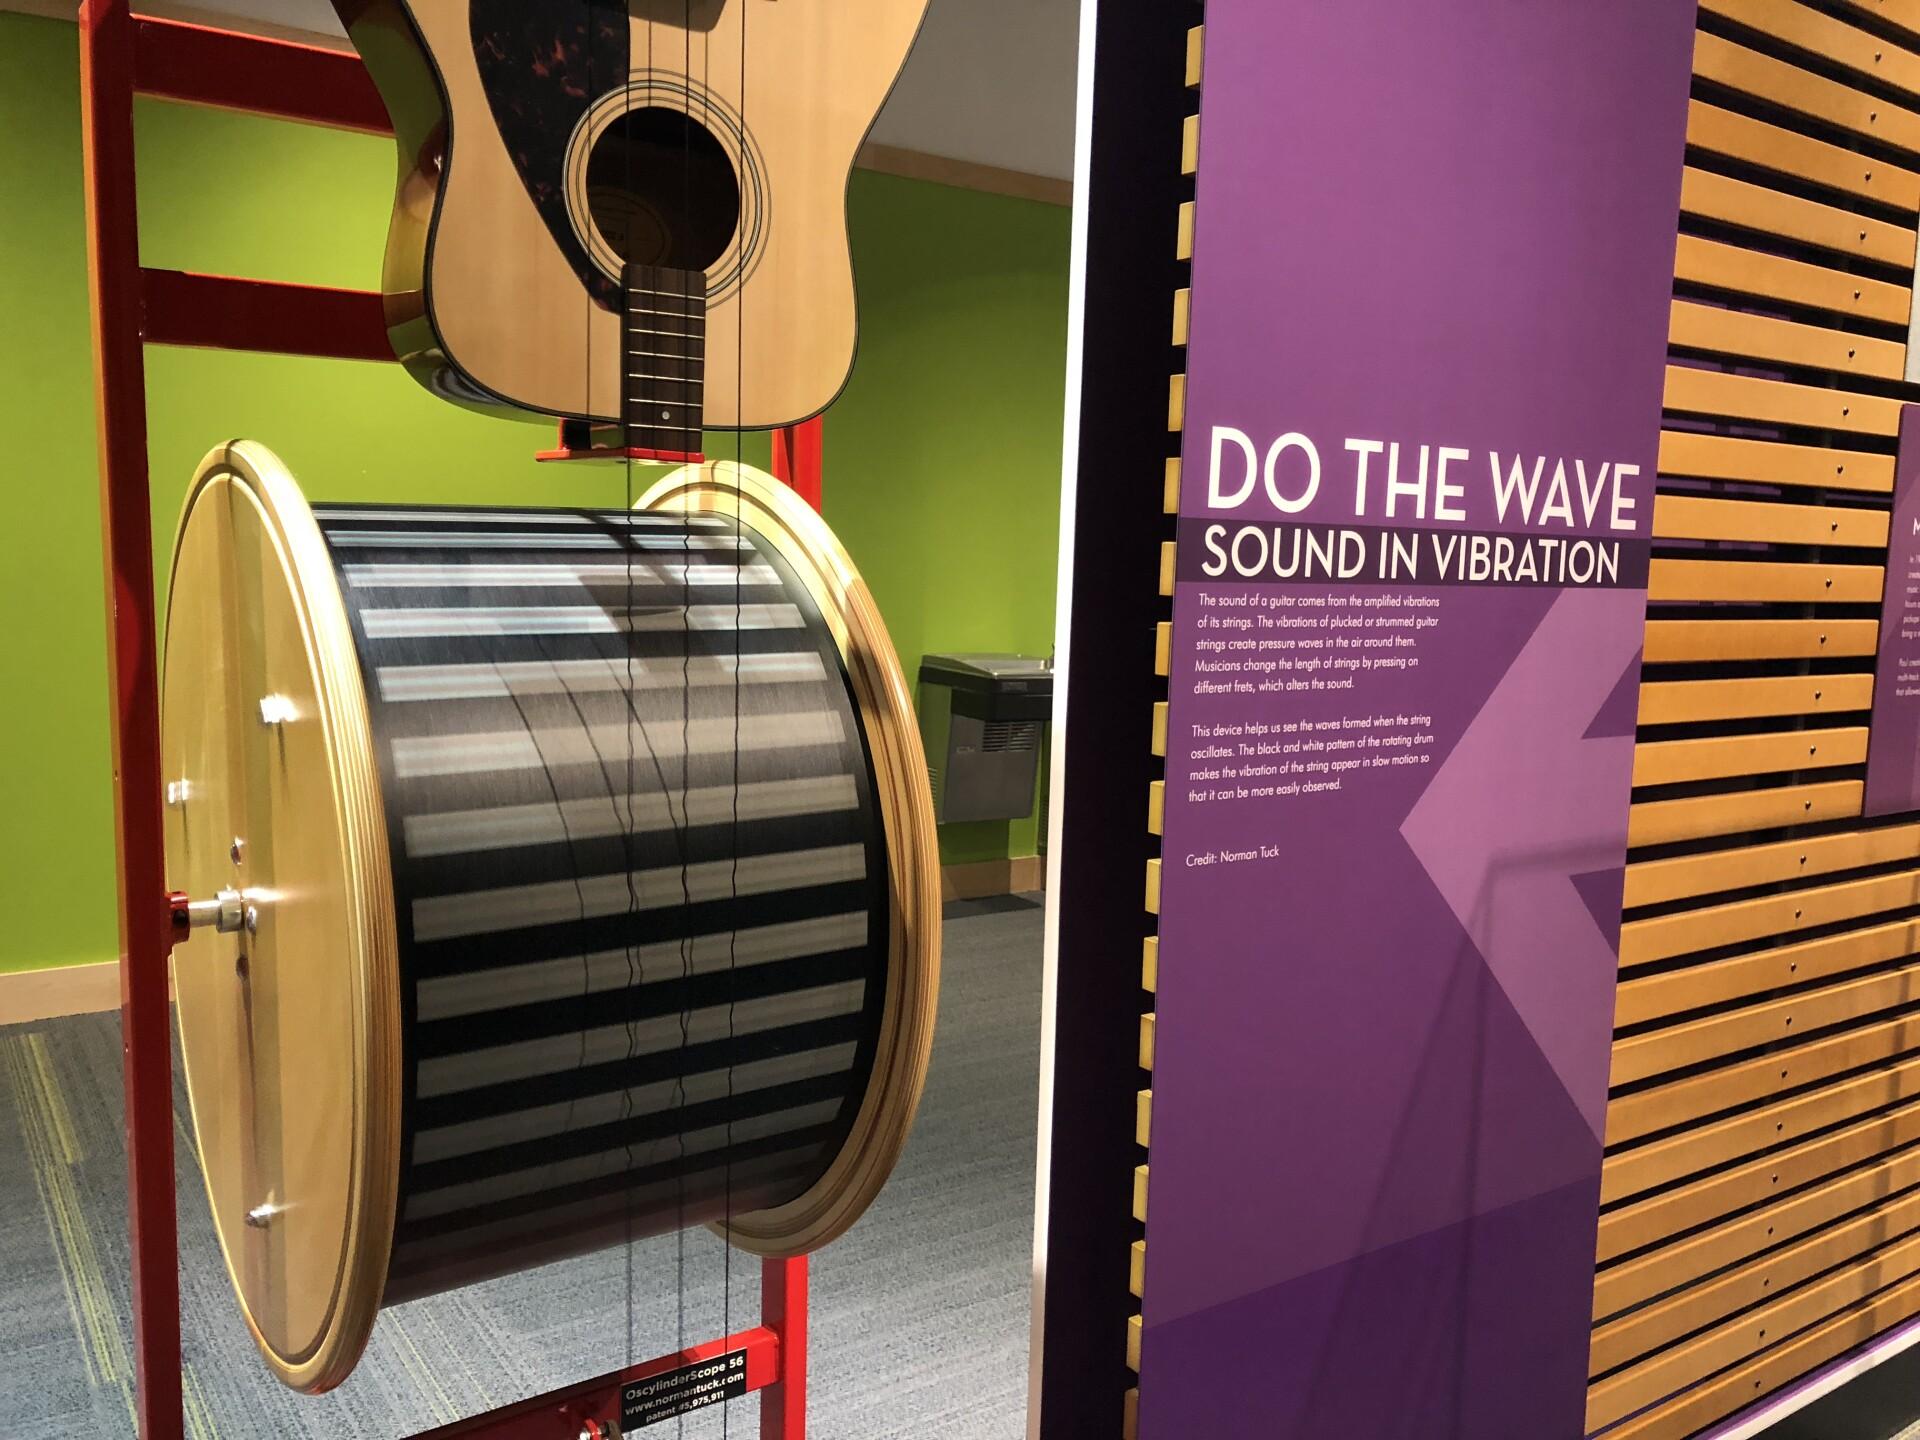 Photos: New, innovative exhibit opens at Kalamazoomuseum